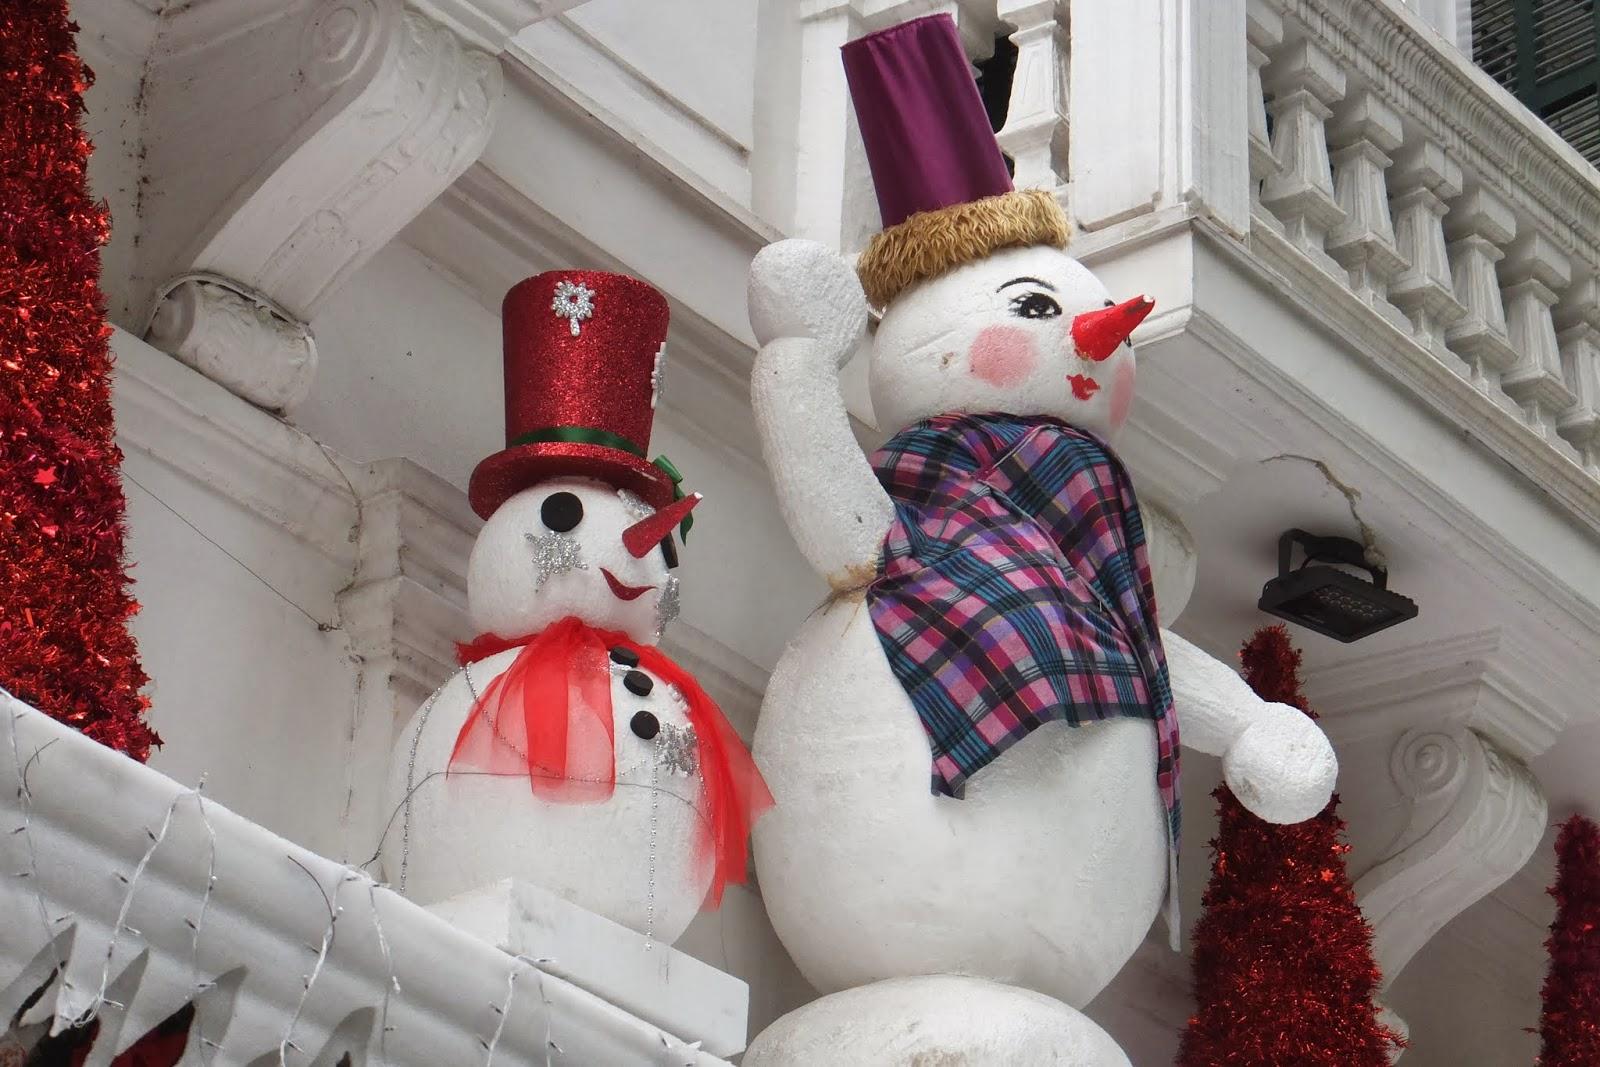 snowman-snowwoman-hanoi-vietnam ベトナムのお姉さま系雪だるま